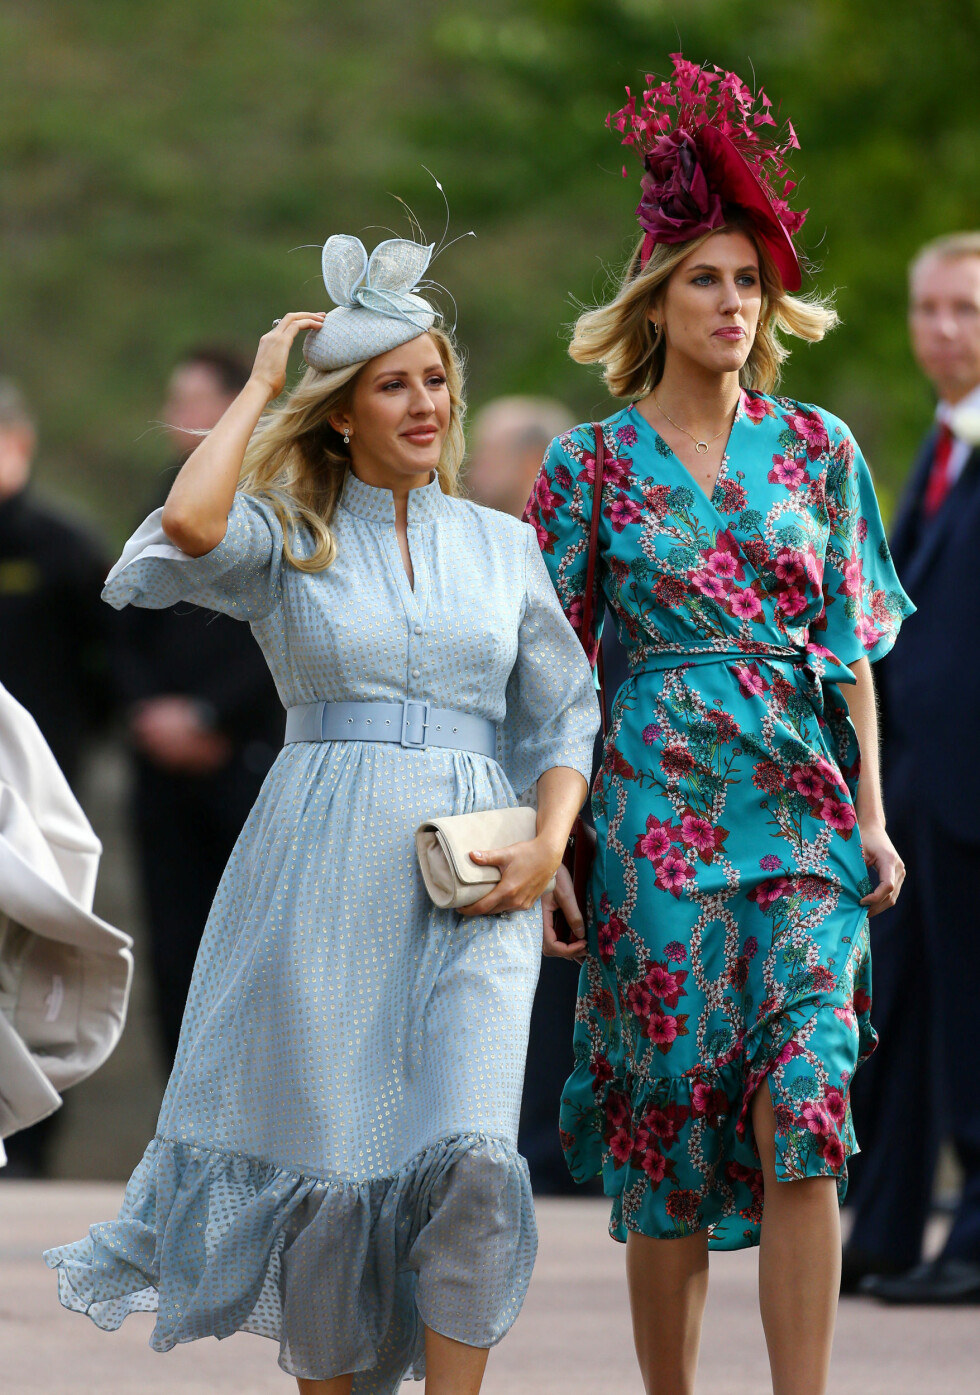 KONGELIG BRYLLUP: Artist Ellie Goulding var gjest i bryllupet. FOTO: NTB Scanpix